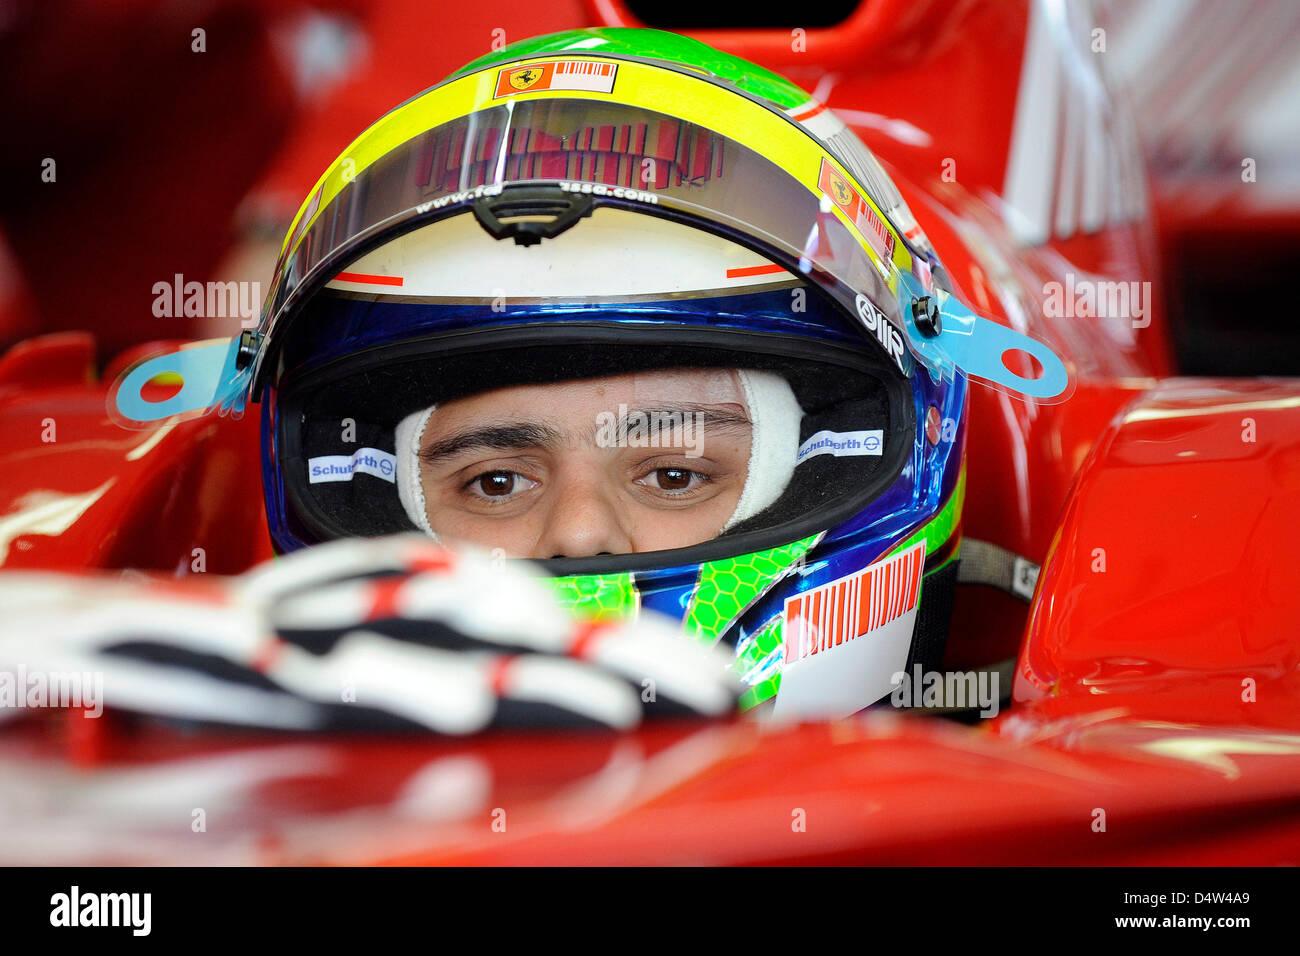 Brazilian Formula One driver Felipe Massa of Ferrari sits in a Ferrari F2007 race car at the Mugello test track - Stock Image